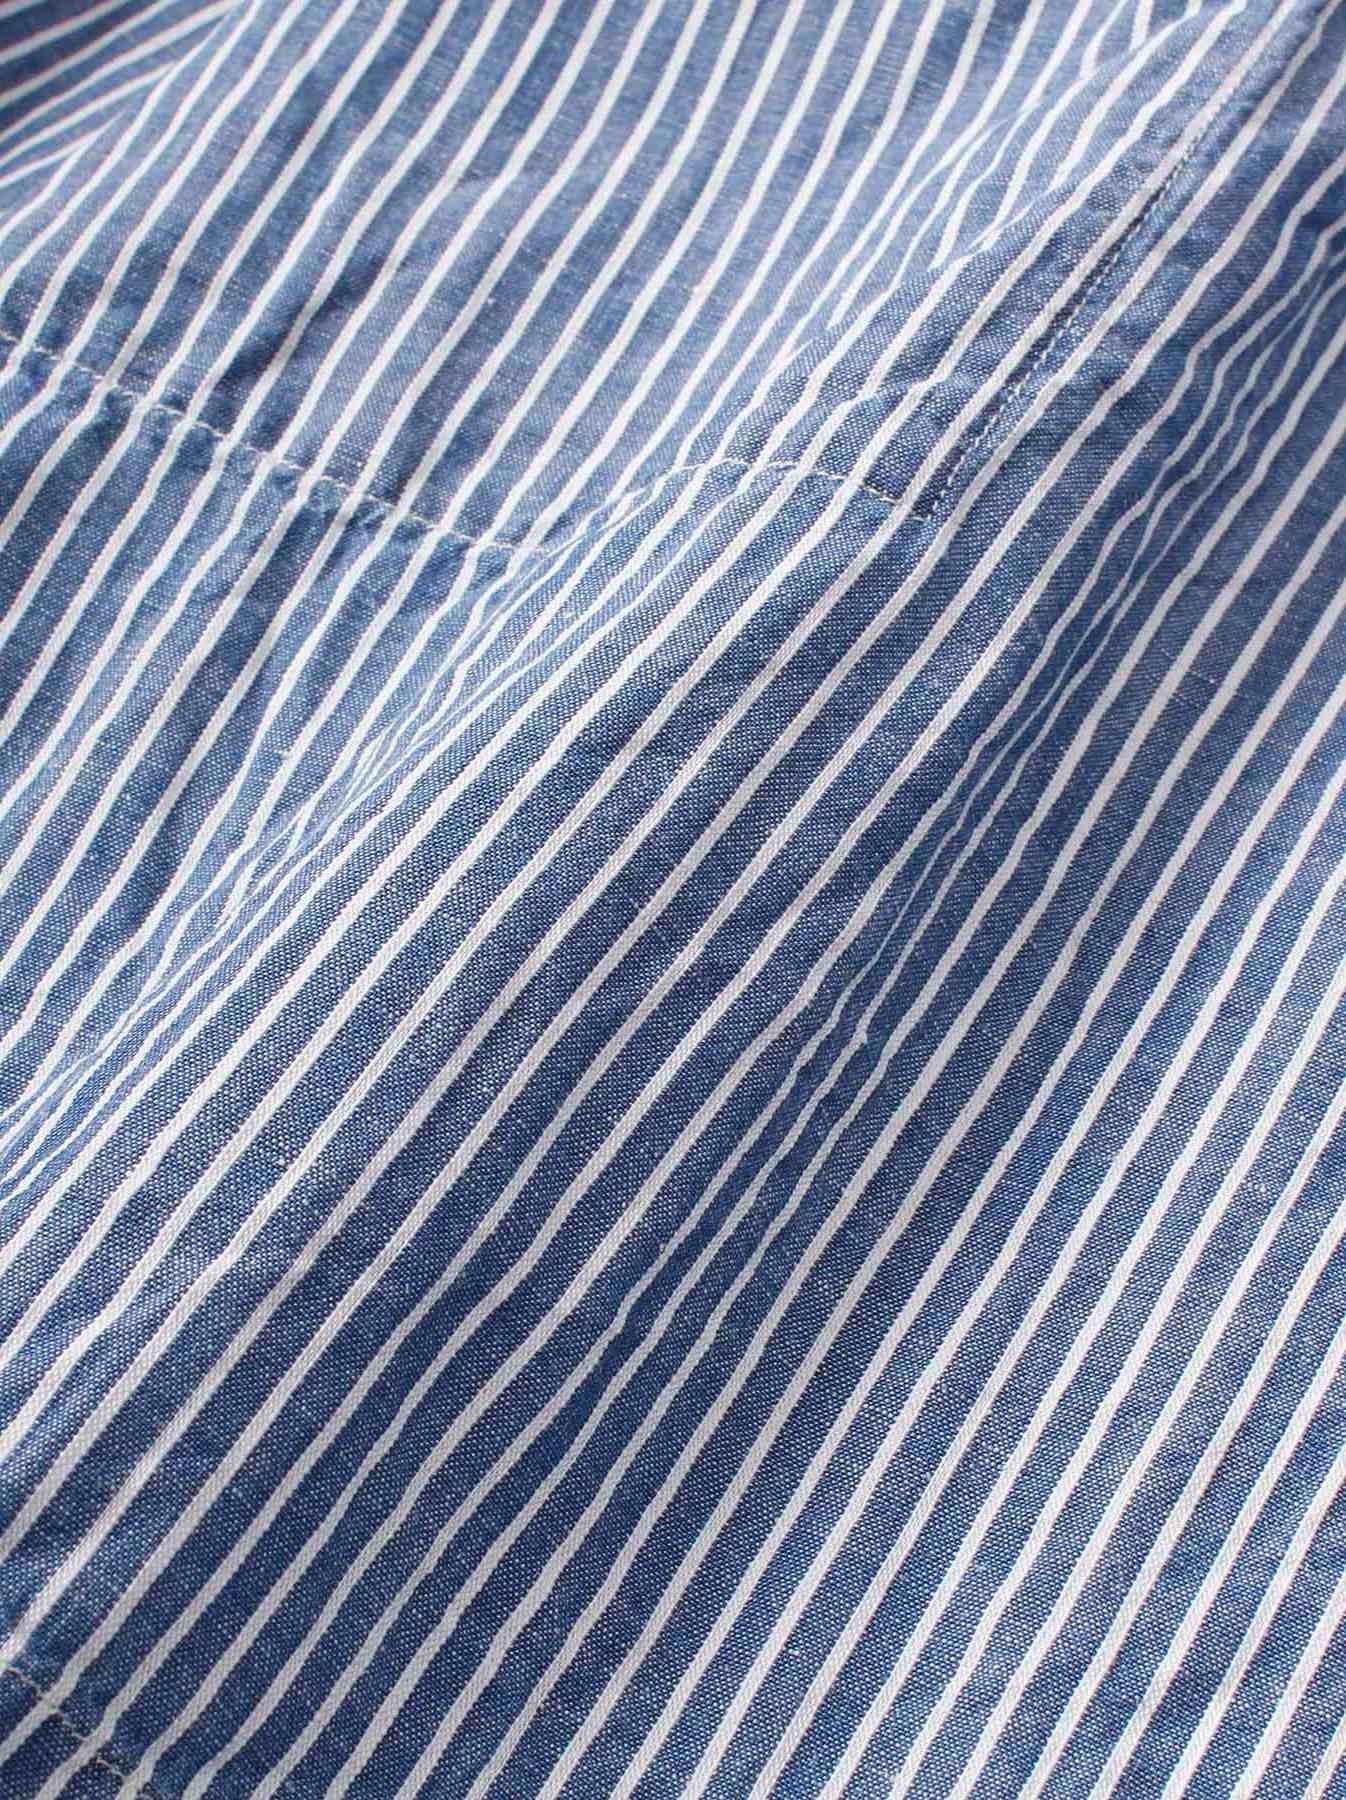 WH Cotton Linen Hickory Umahiko Pullover Shirt-11